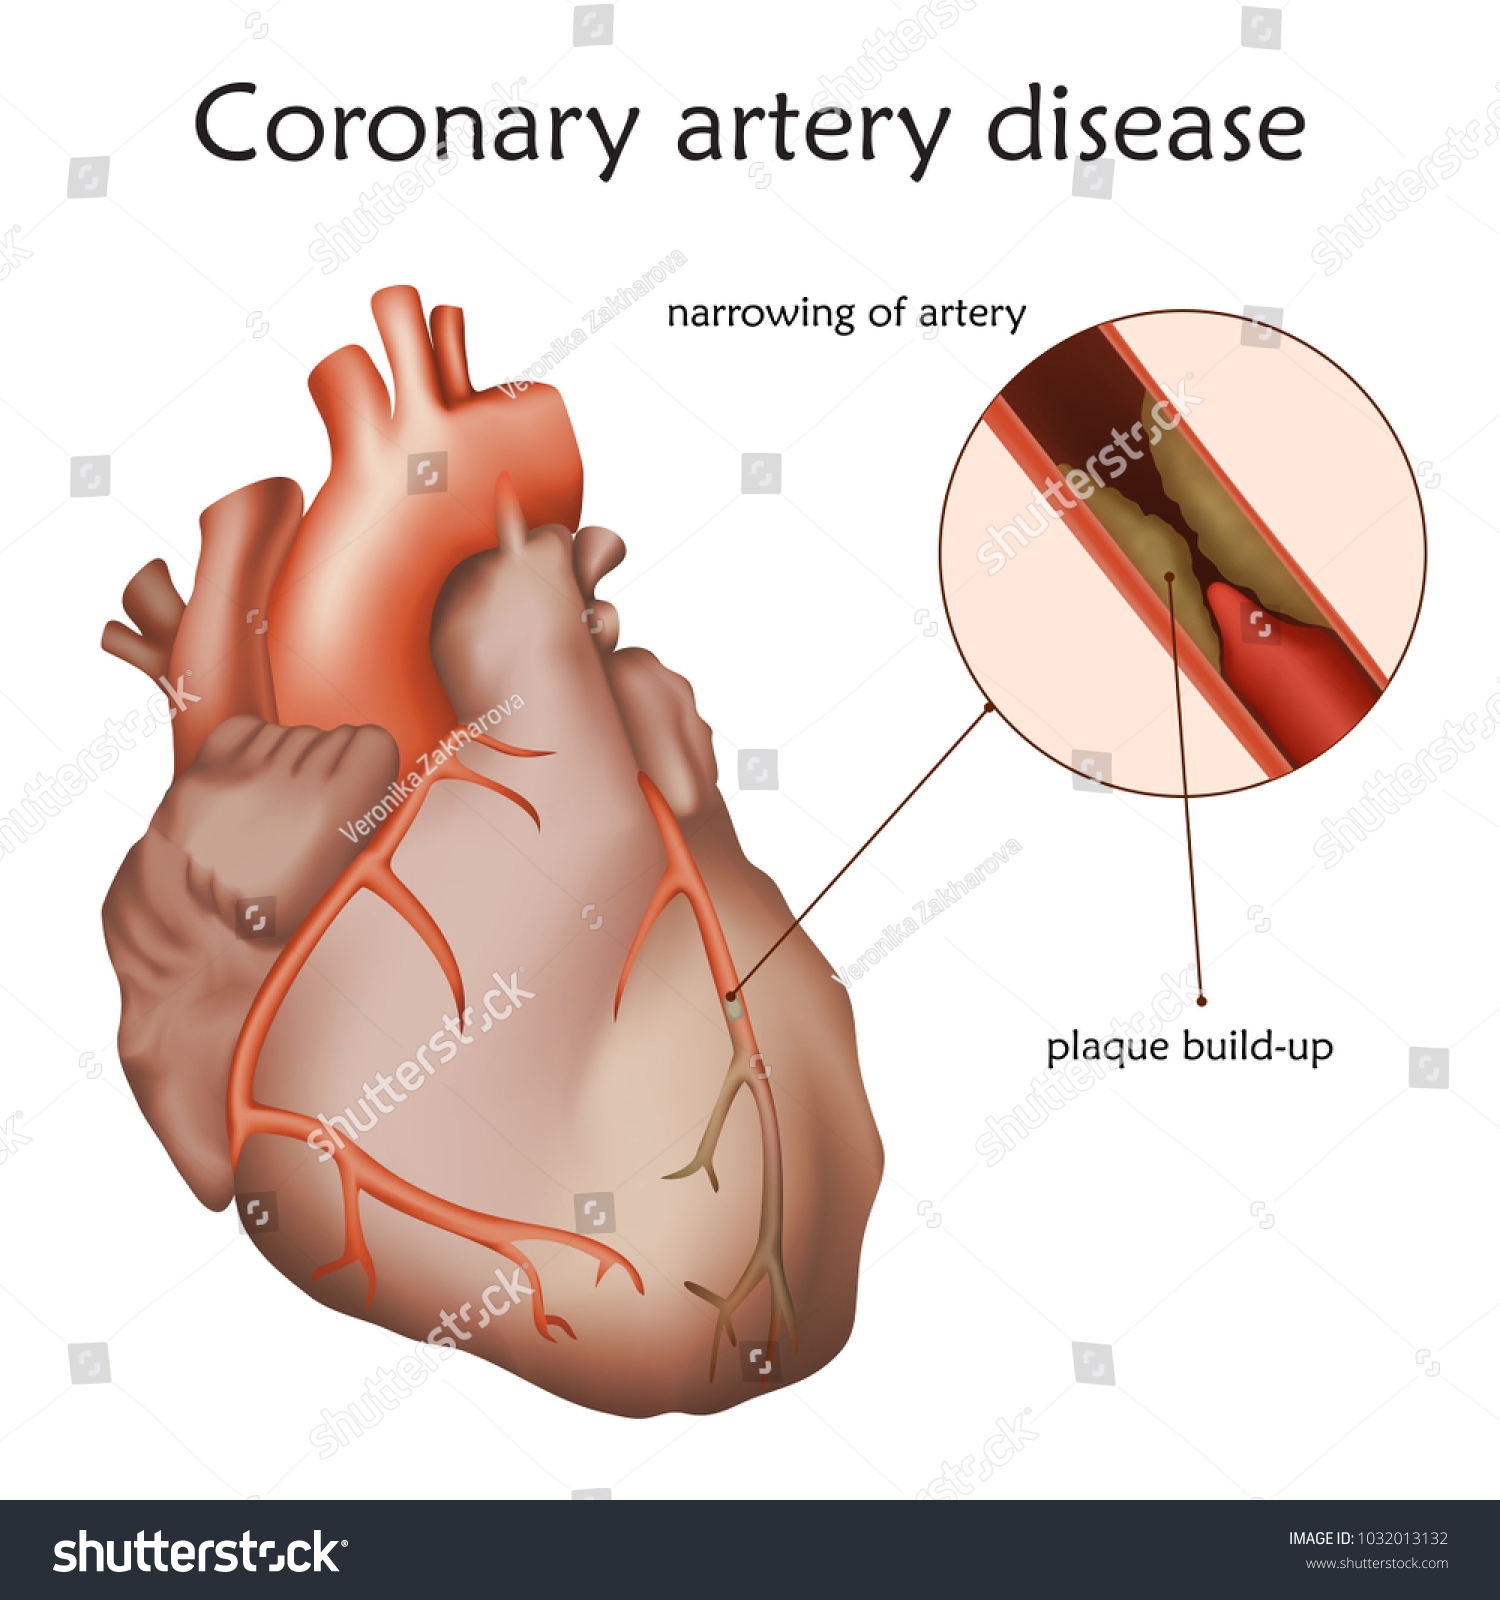 Coronary Artery Disease Blocked Artery Damaged Stock Photo (Photo ...